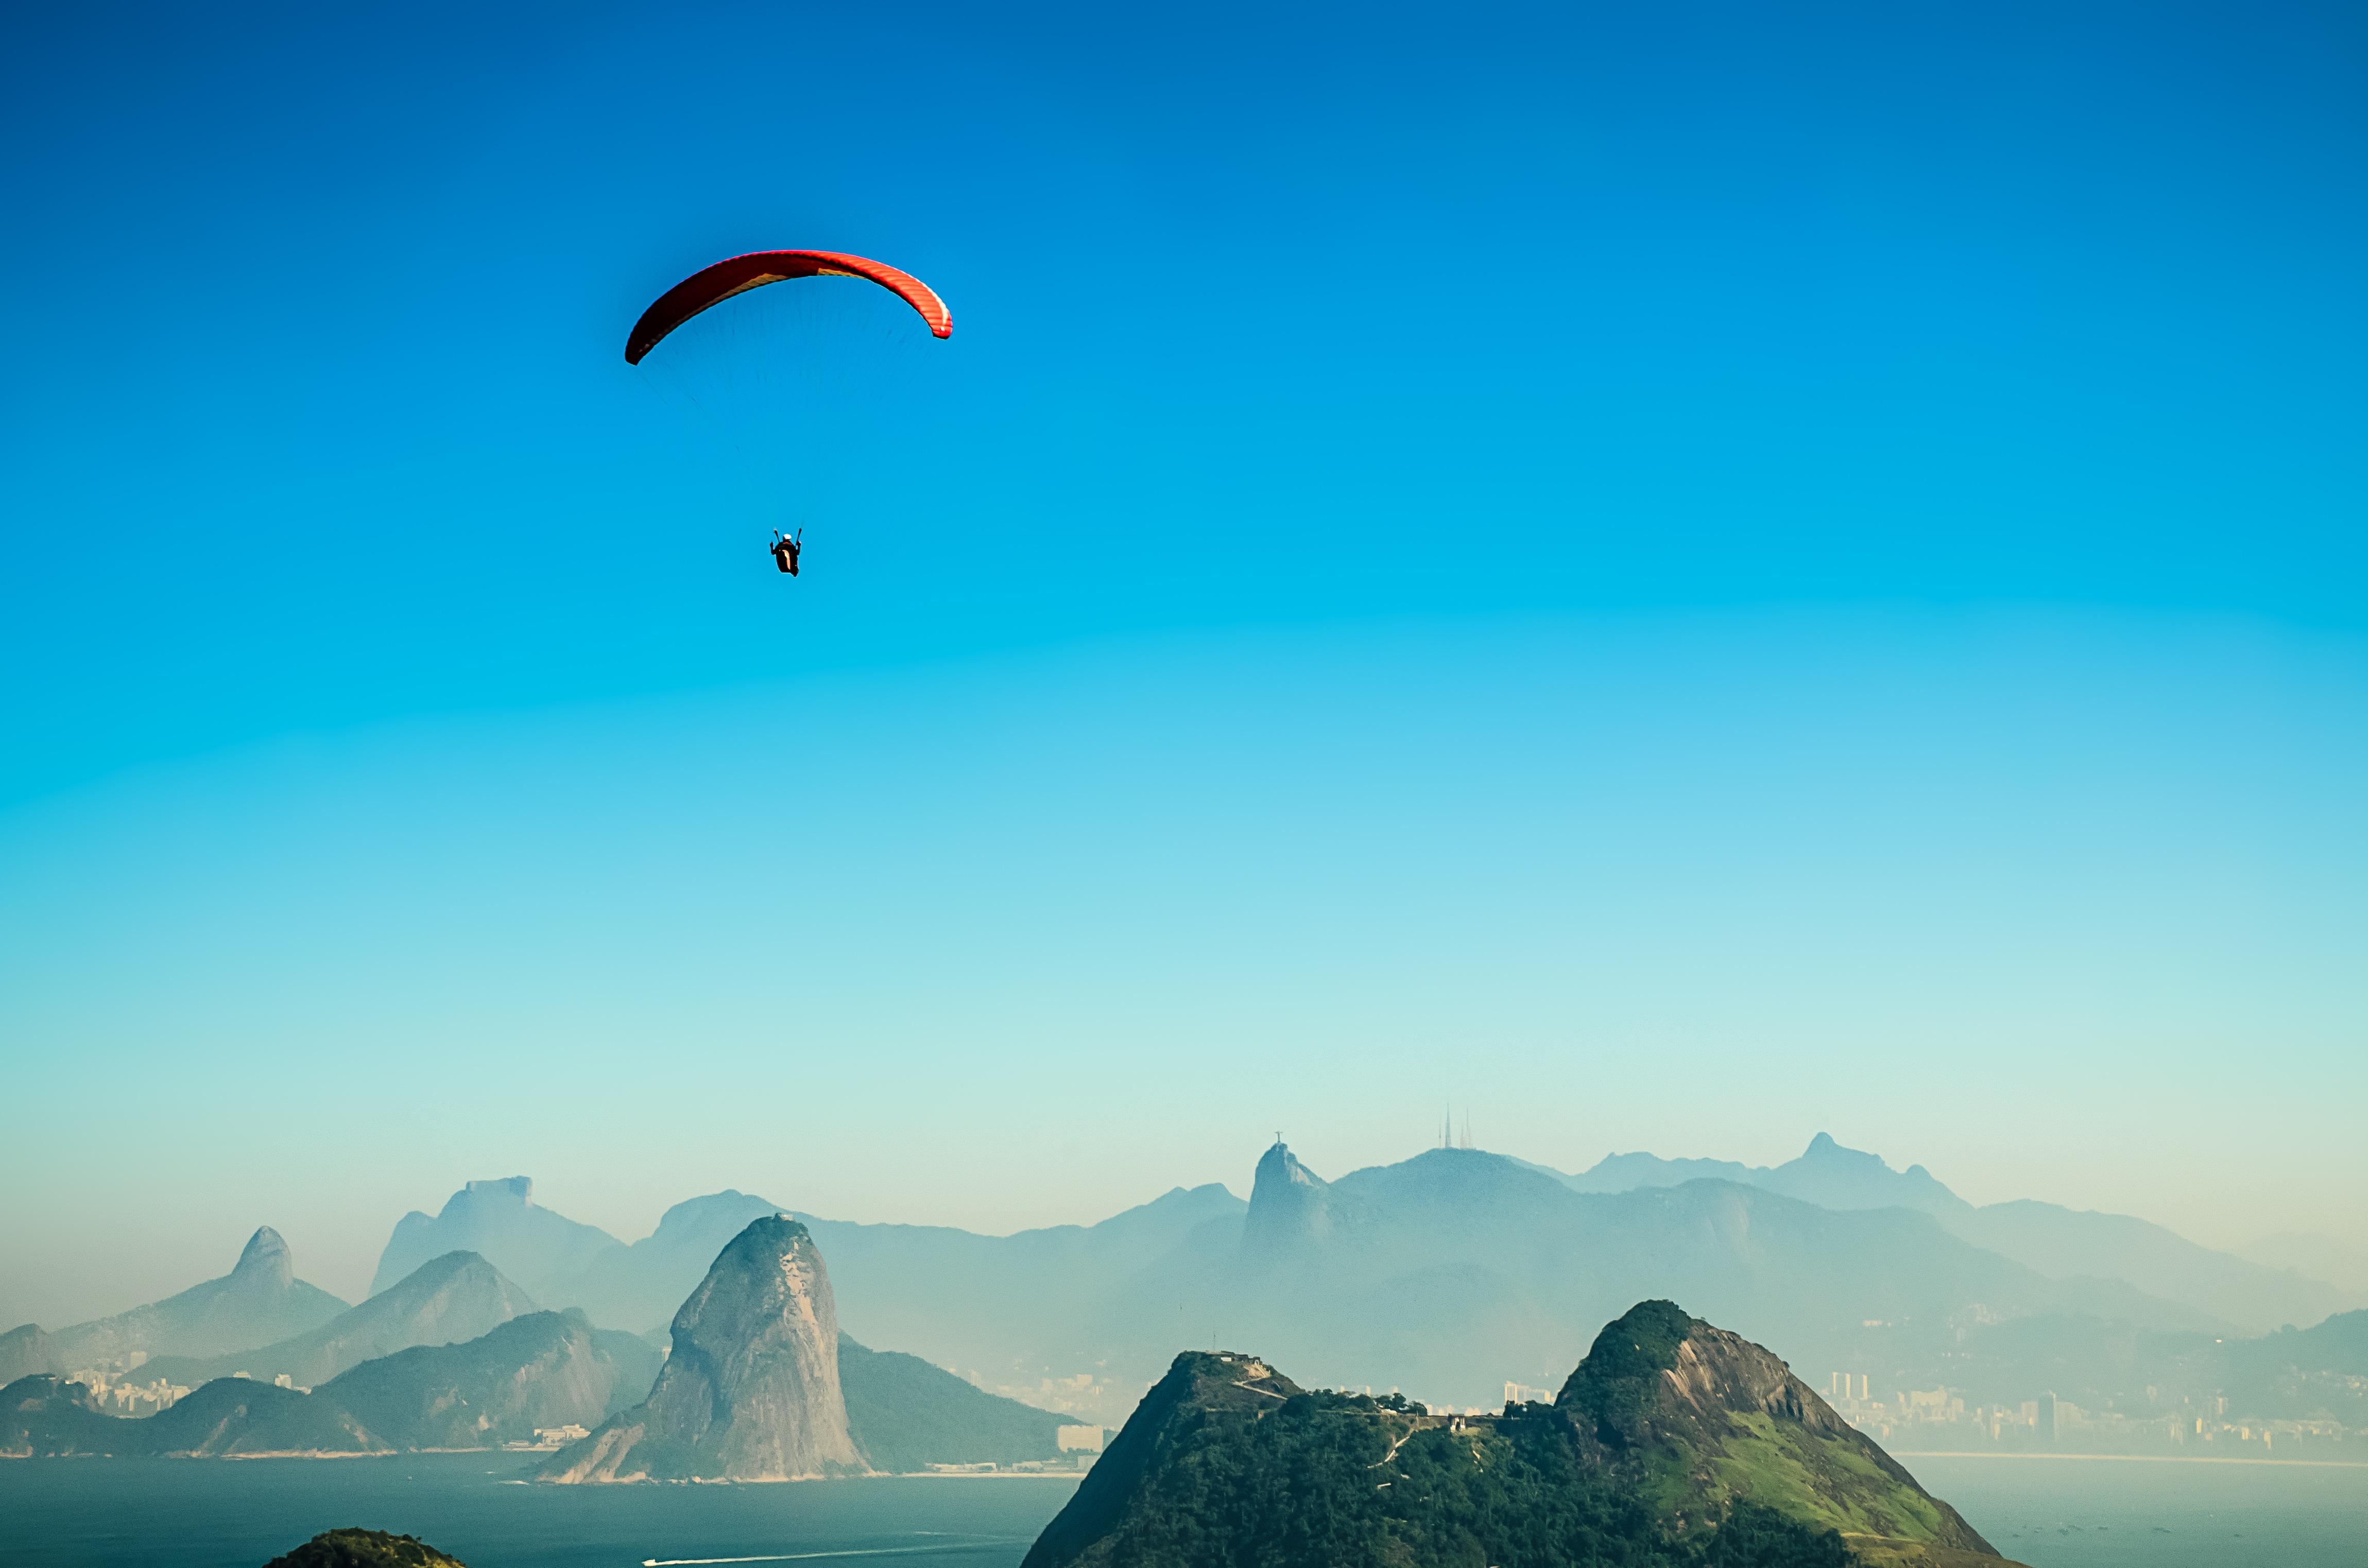 Rio De Janeiro Wallpaper Iphone Person In Parachute Gliding Above Mountains 183 Free Stock Photo